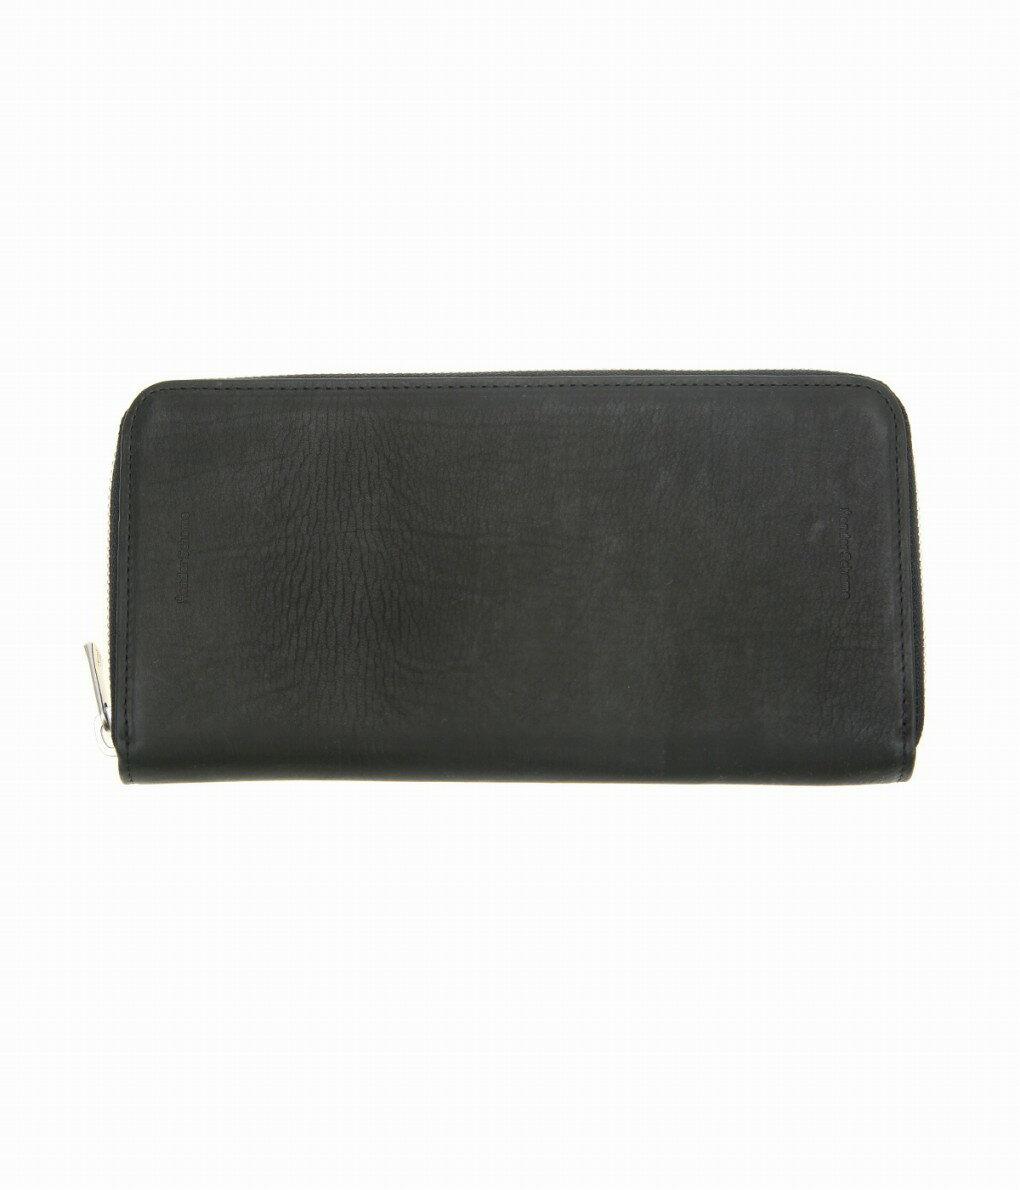 財布・ケース, メンズ財布 Hender Scheme : long zip purse 2 : : ct-rc-lzp RIPBJB